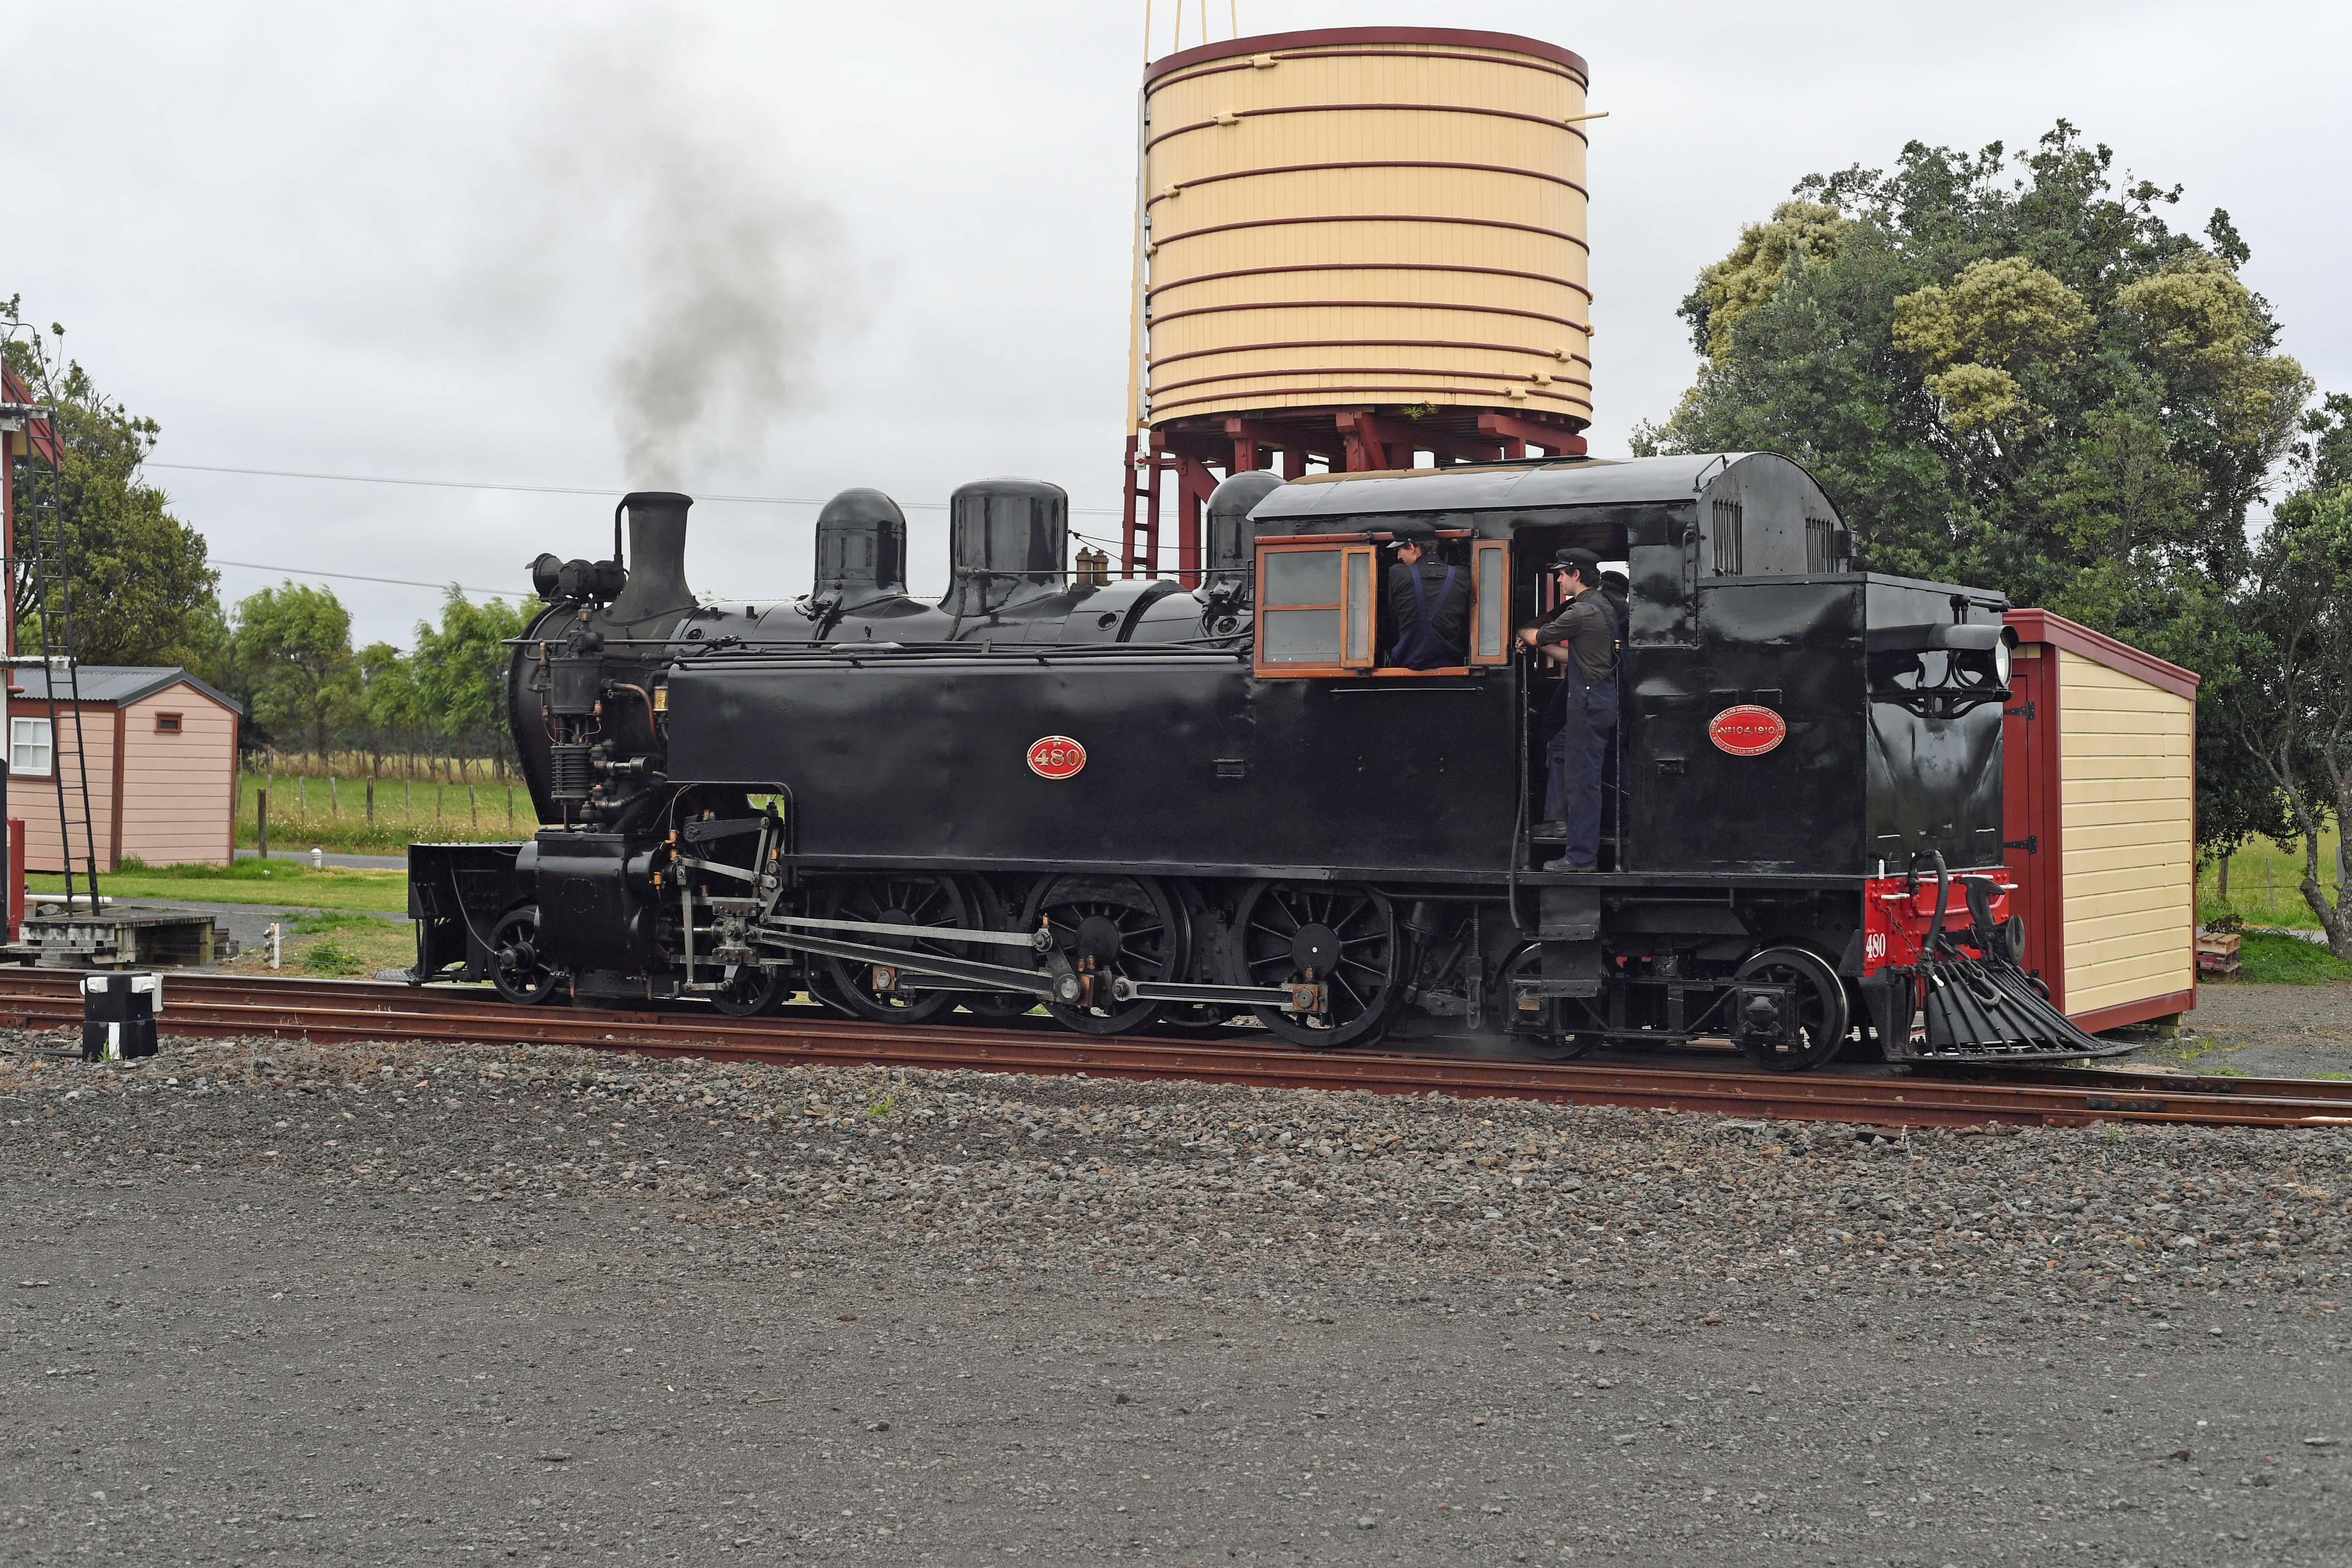 dg318335. 480. glenbrook vintage railway. glenbrook. north island. new zealand. 27.1.19crop